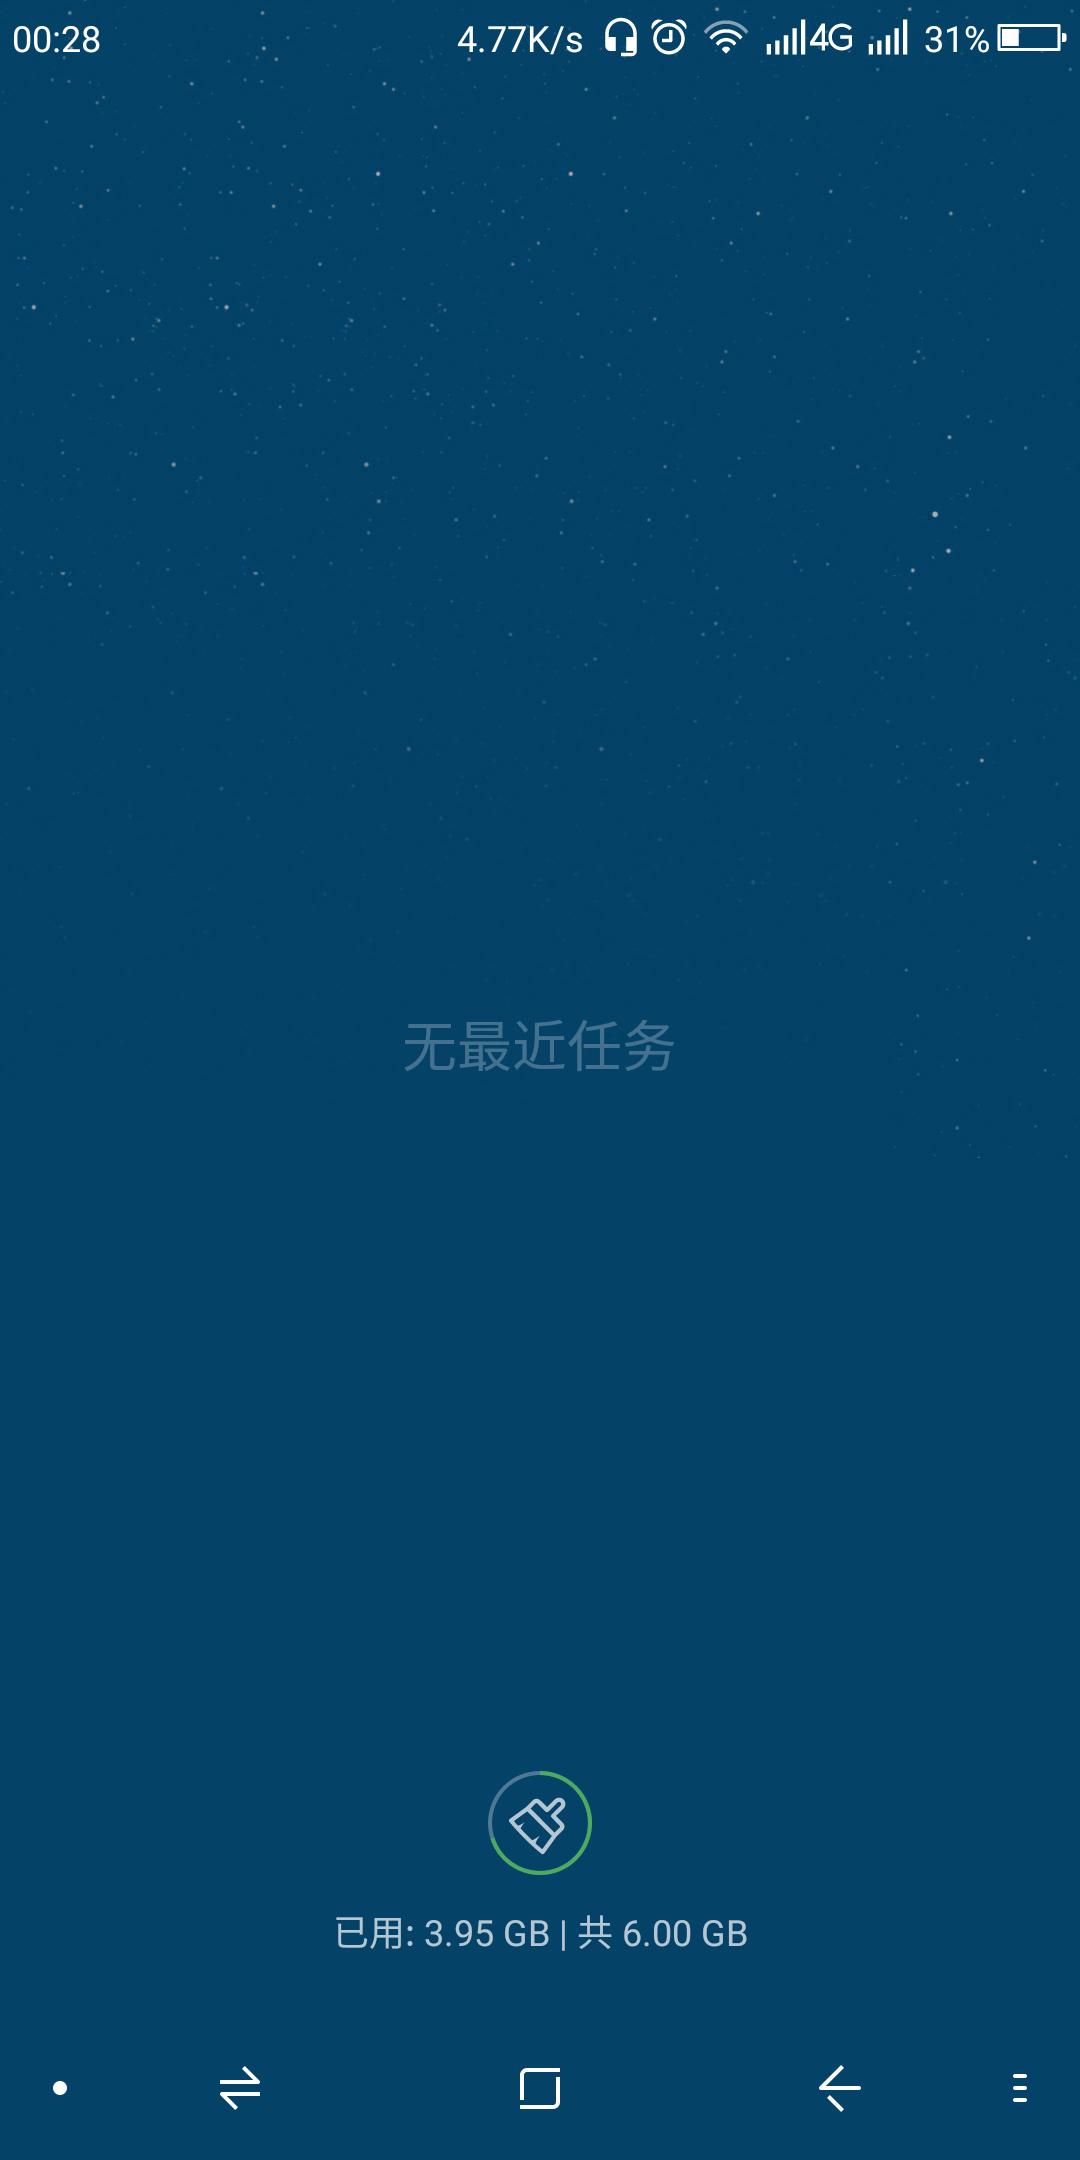 Screenshot_2020-05-07-00-28-16.png